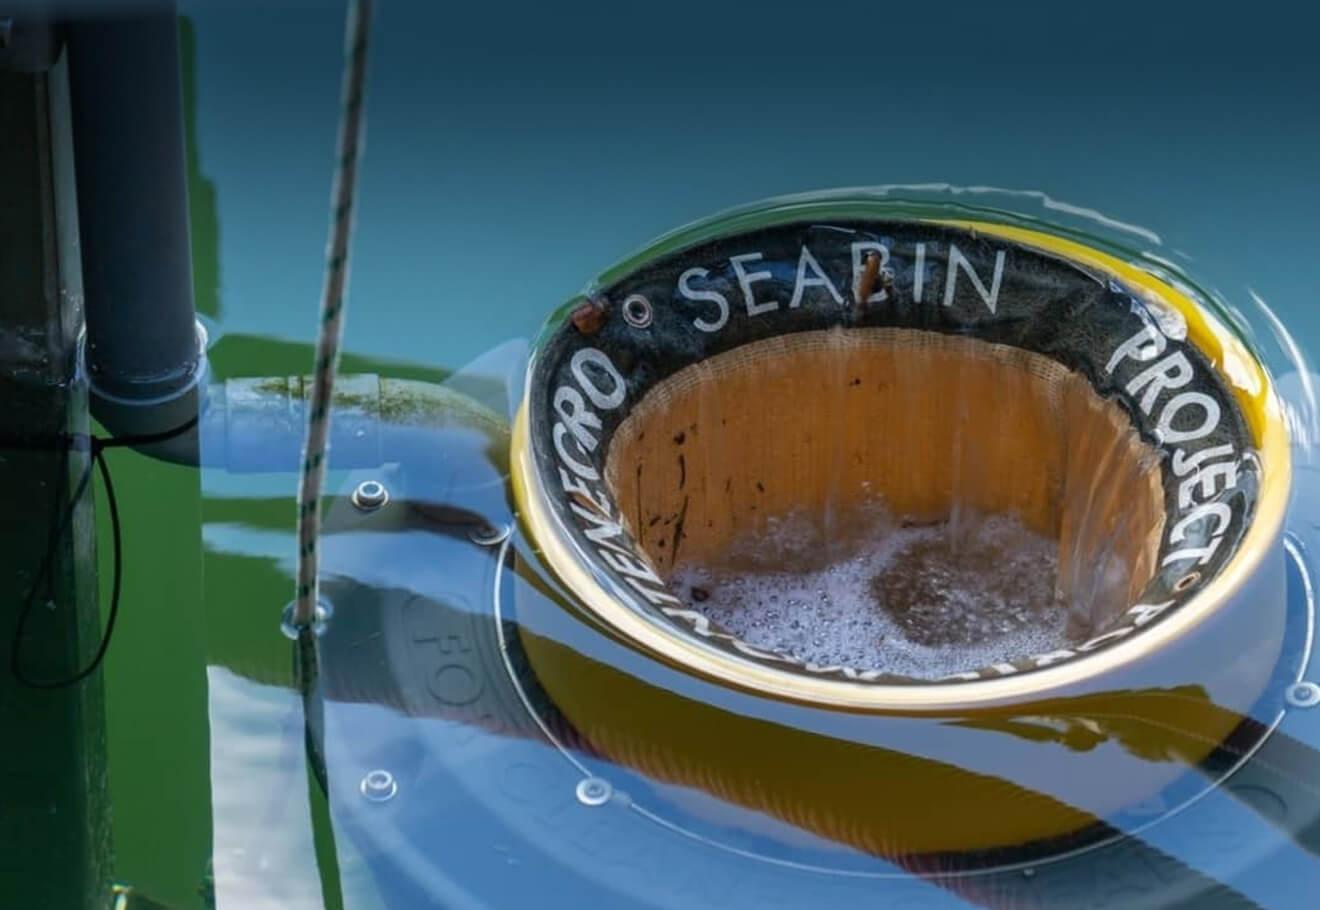 Seabin collecting marine debris in marinas